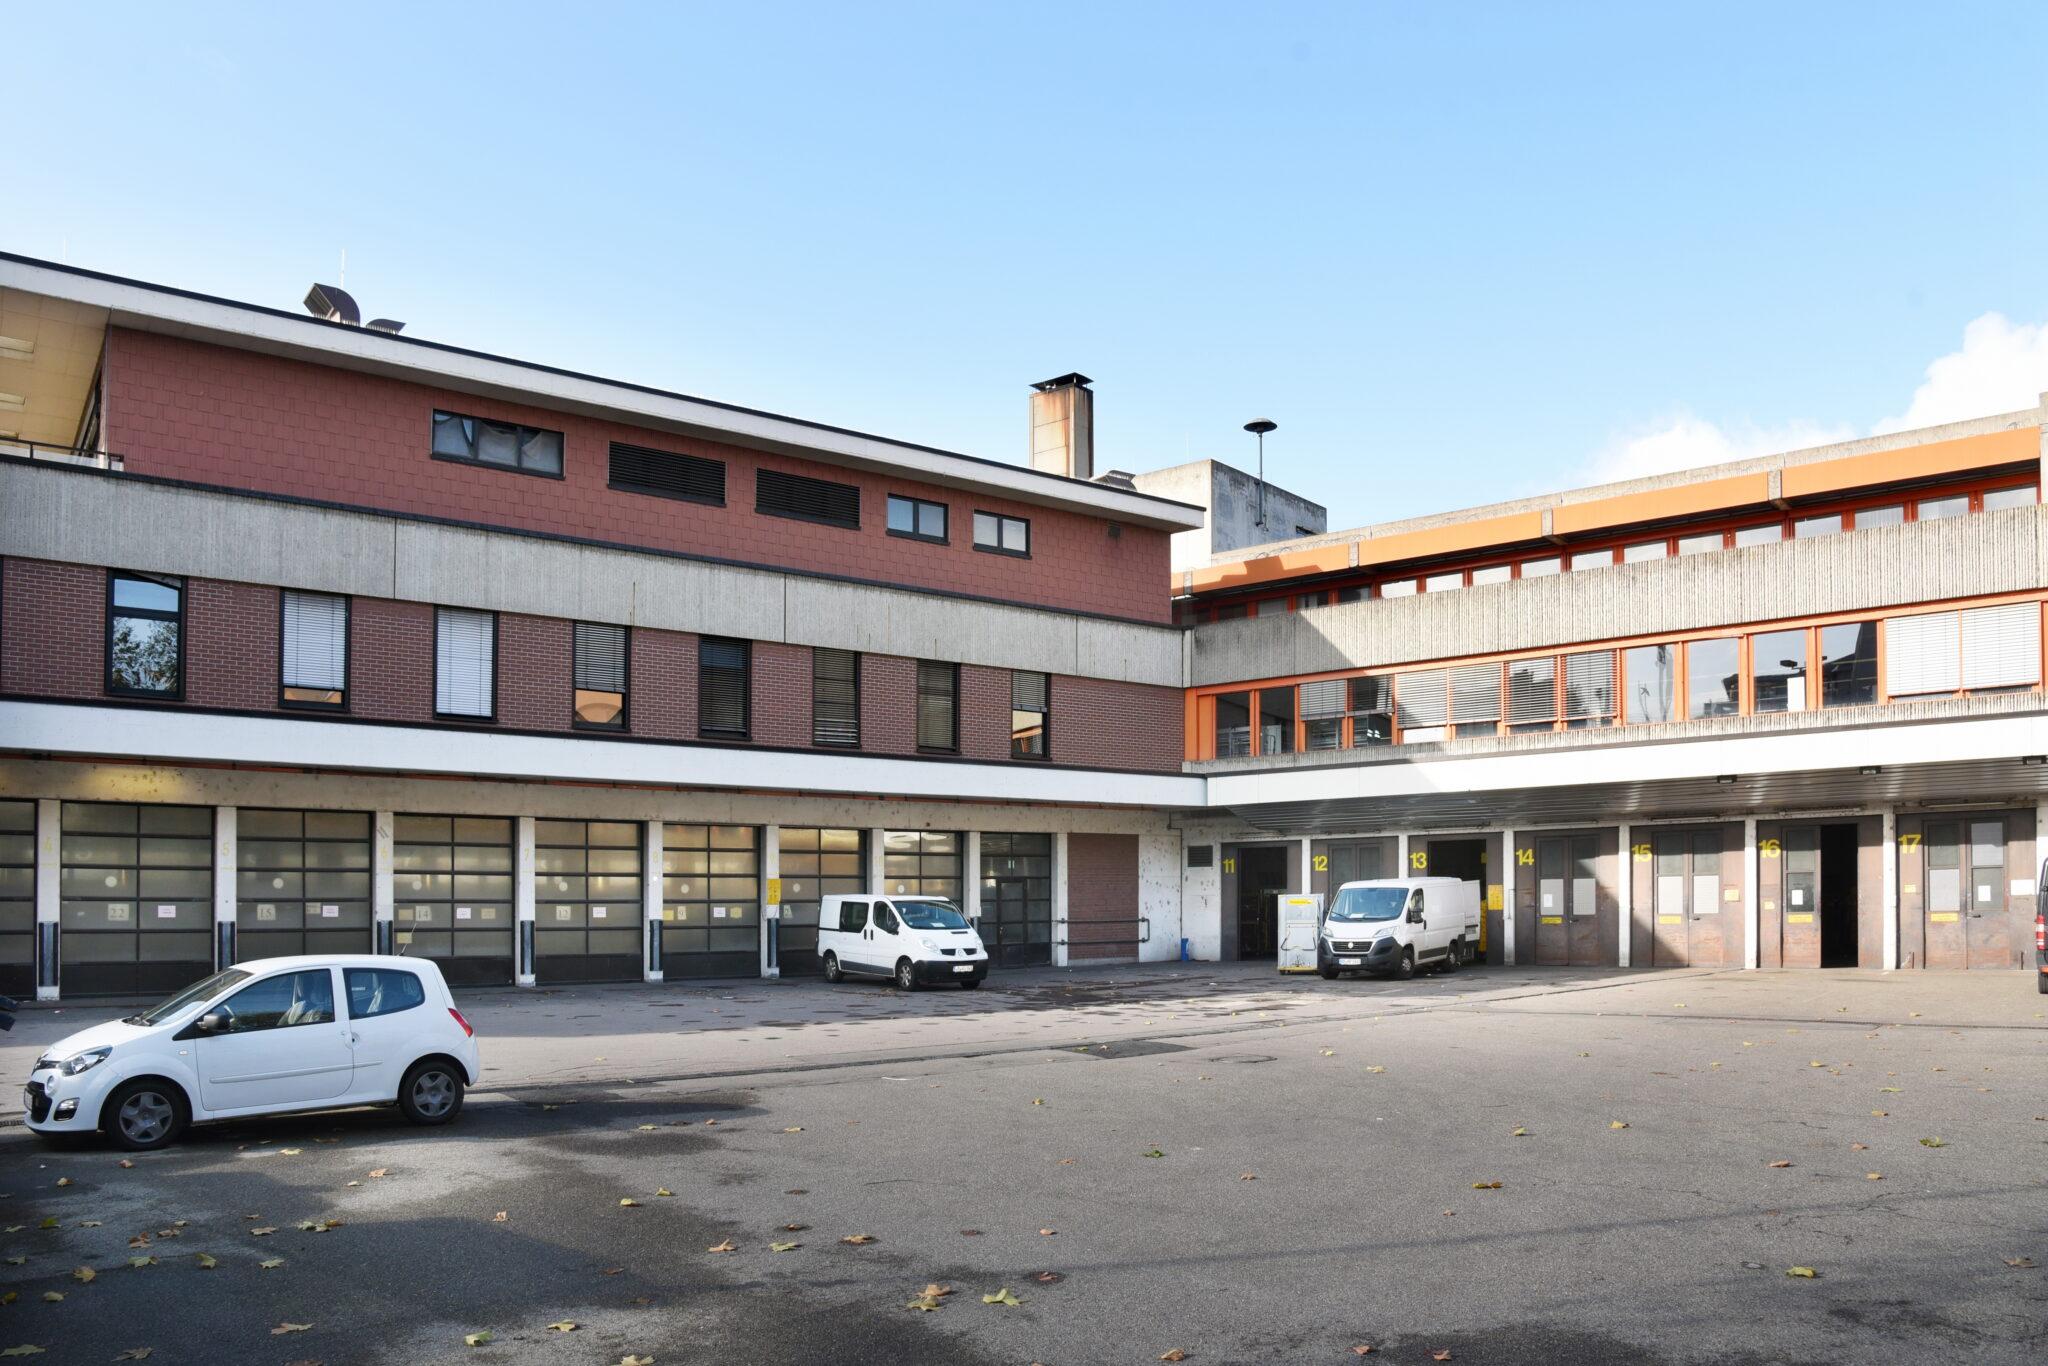 Postareal Böblingen: Bestand (Bild: BBG (Böblinger Baugesellschaft mbH)/Günter E. Bergmann - Photography)